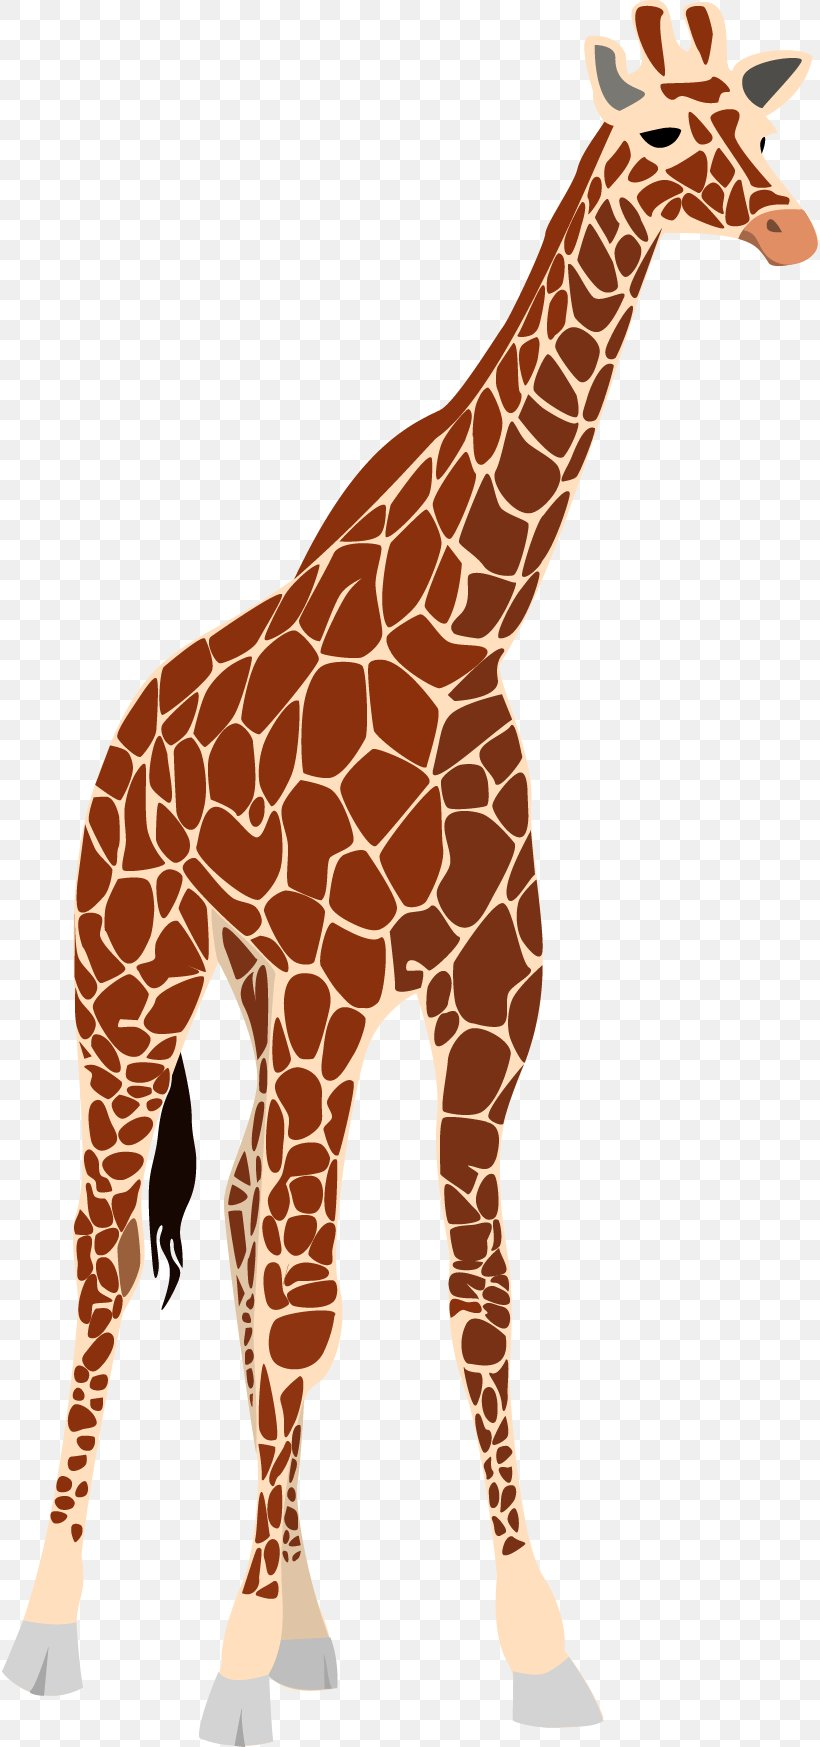 Giraffe Okapi Clip Art, PNG, 816x1747px, Giraffe, Animal, Fauna, Free Content, Giraffidae Download Free